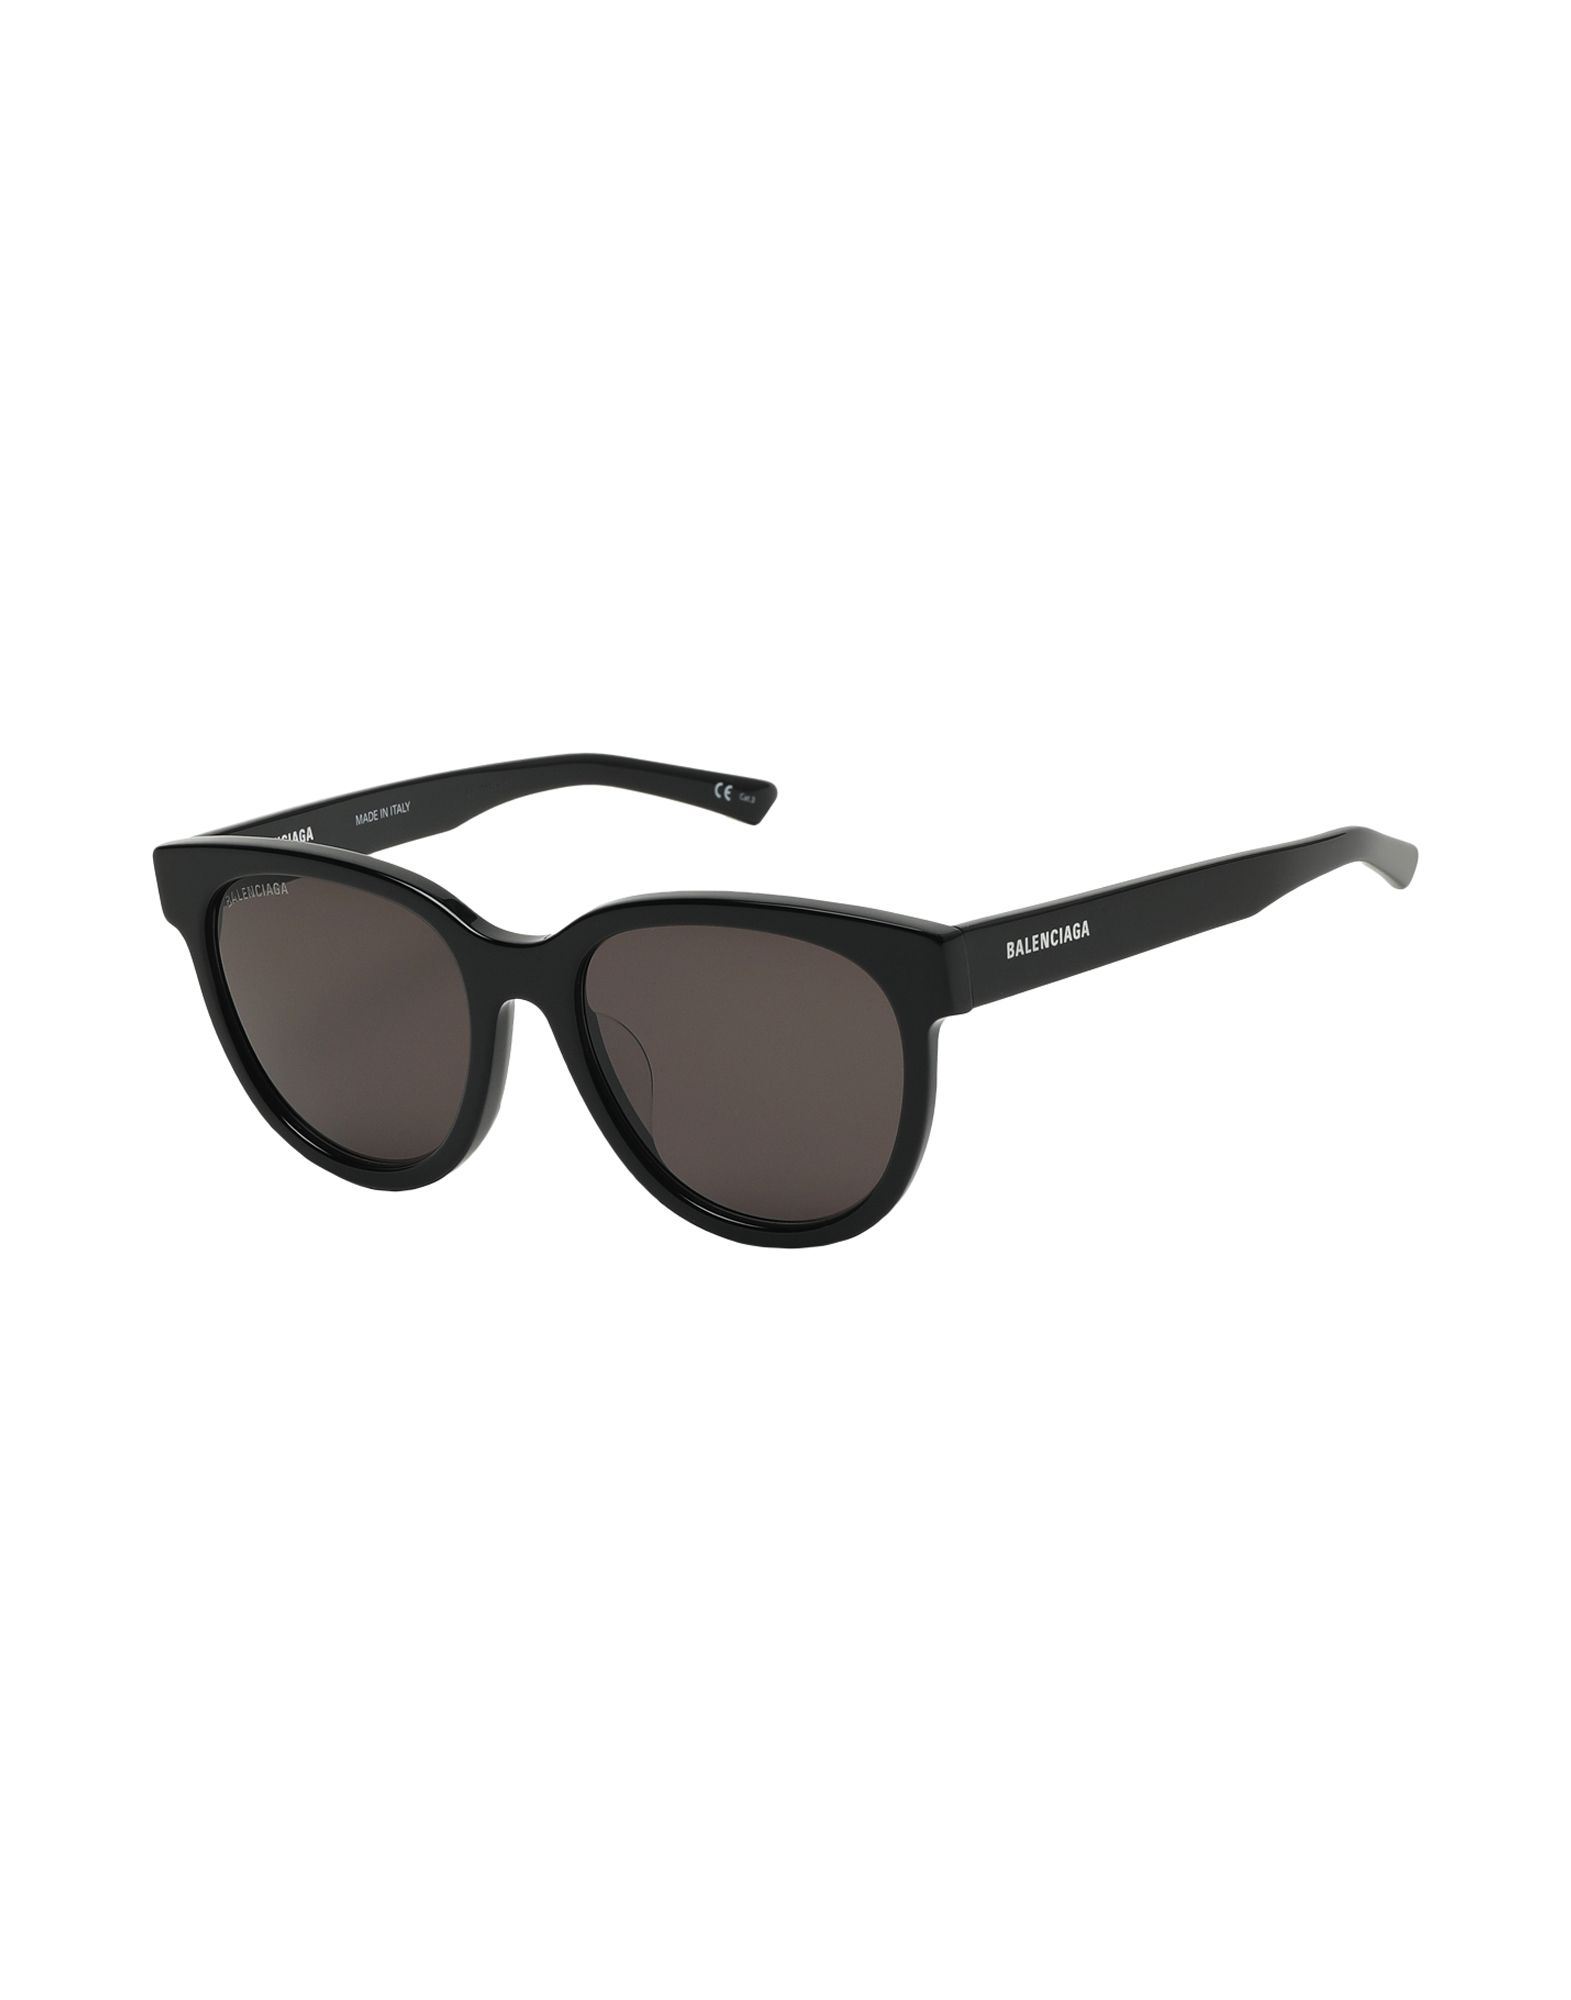 BALENCIAGA Sunglasses - Item 46698943